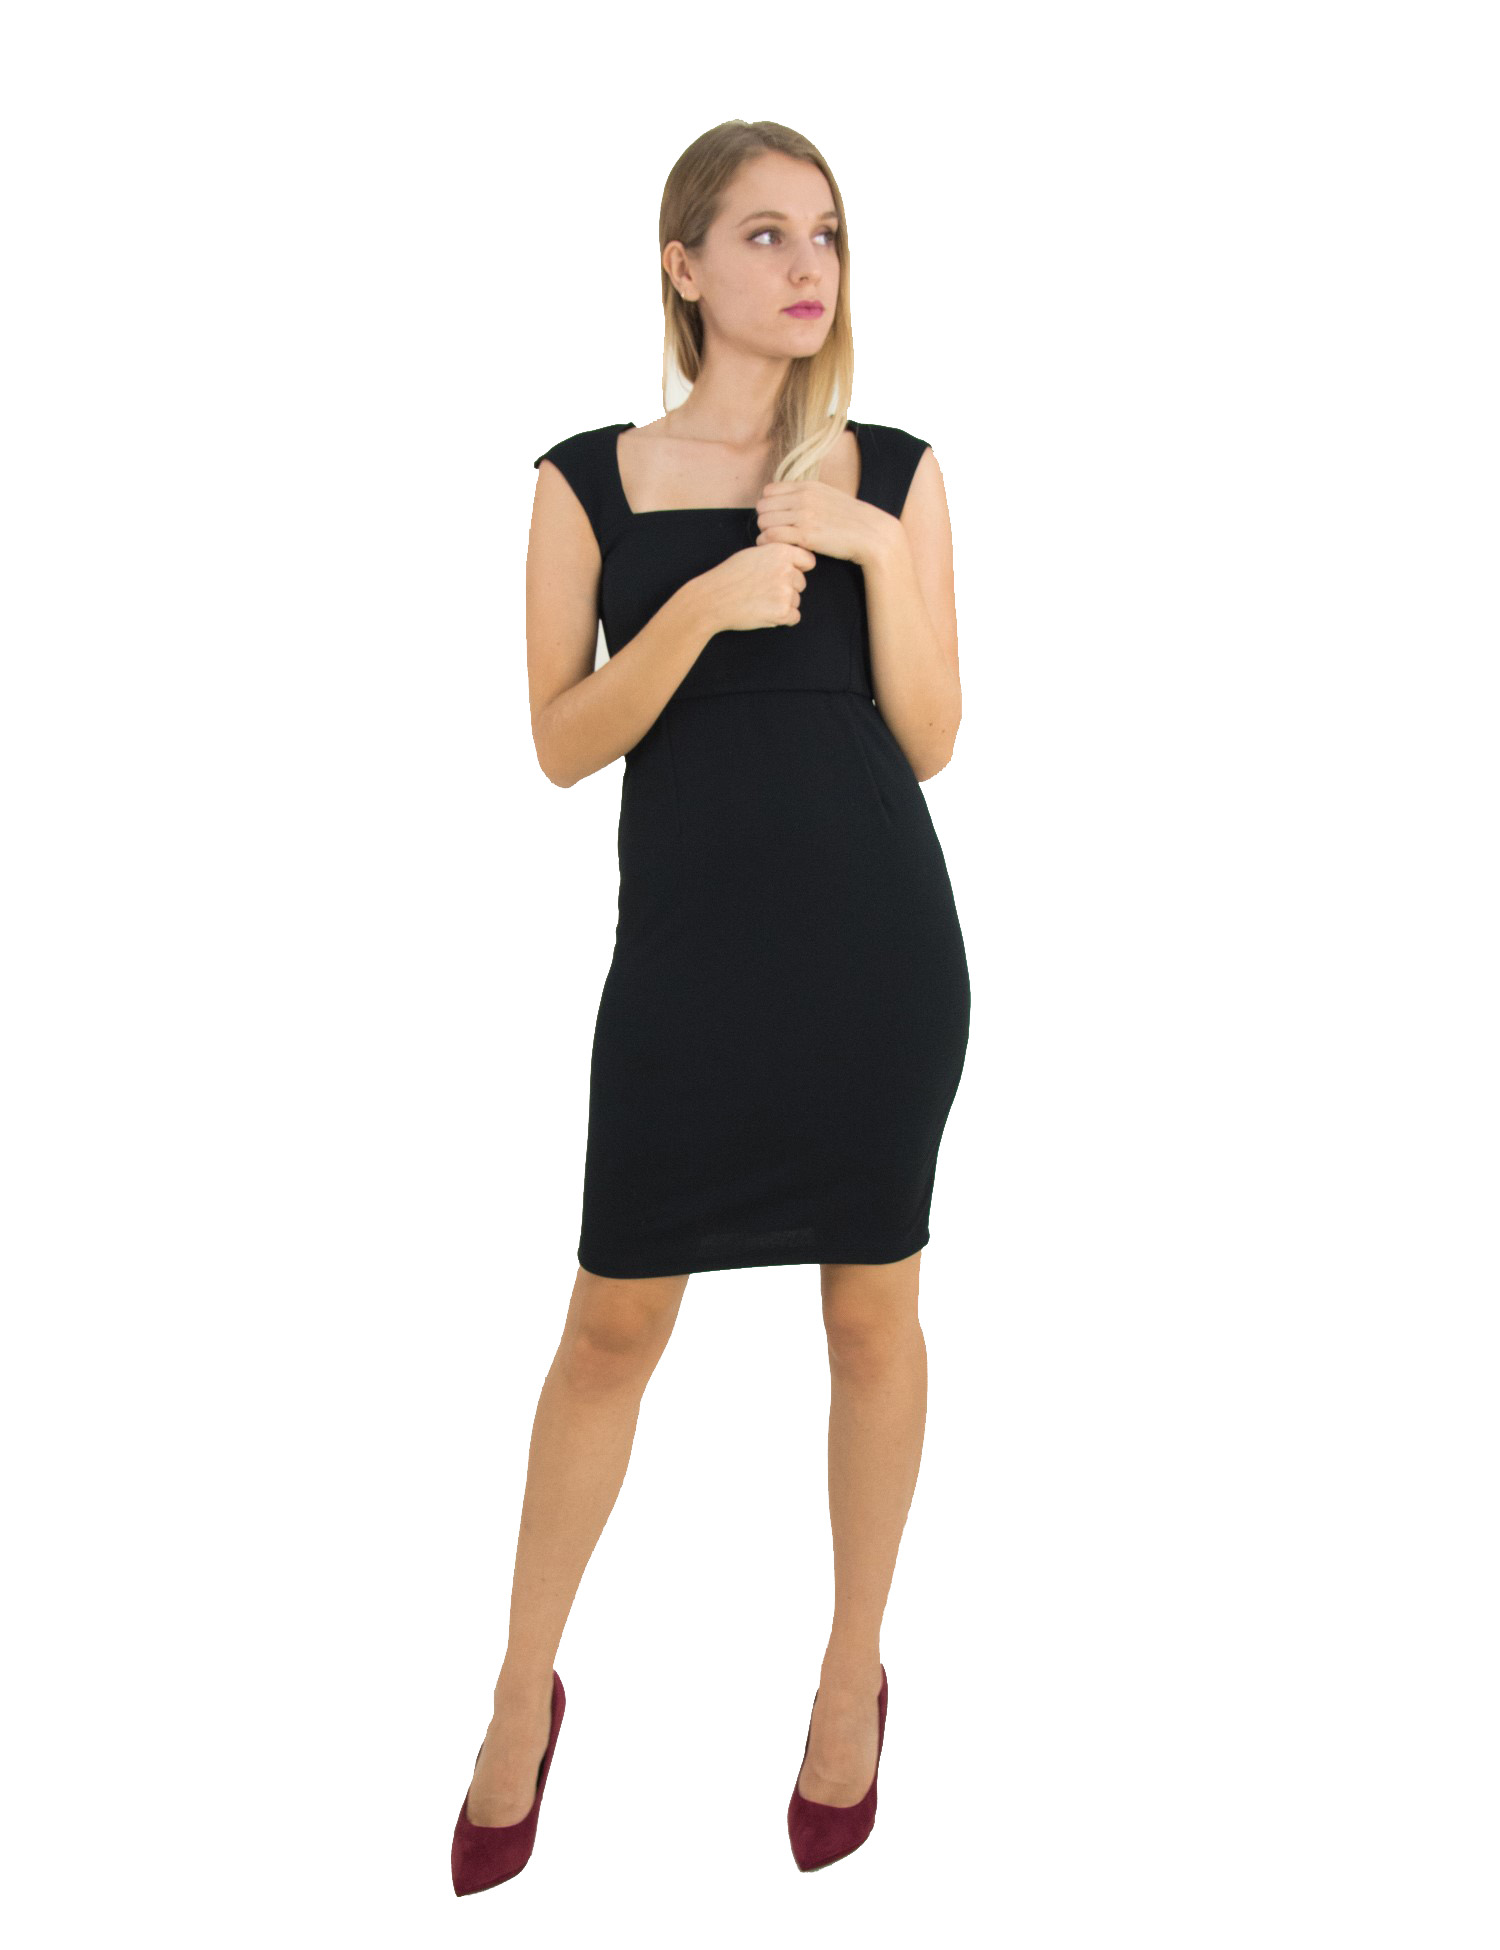 25a19c5dd17 No Stress Γυναικείο μαύρο Scuba midi φόρεμα μονόχρωμο 8305129. No Stress Γυναικείο  μαύρο Scuba midi φόρεμα μονόχρωμο 8305129